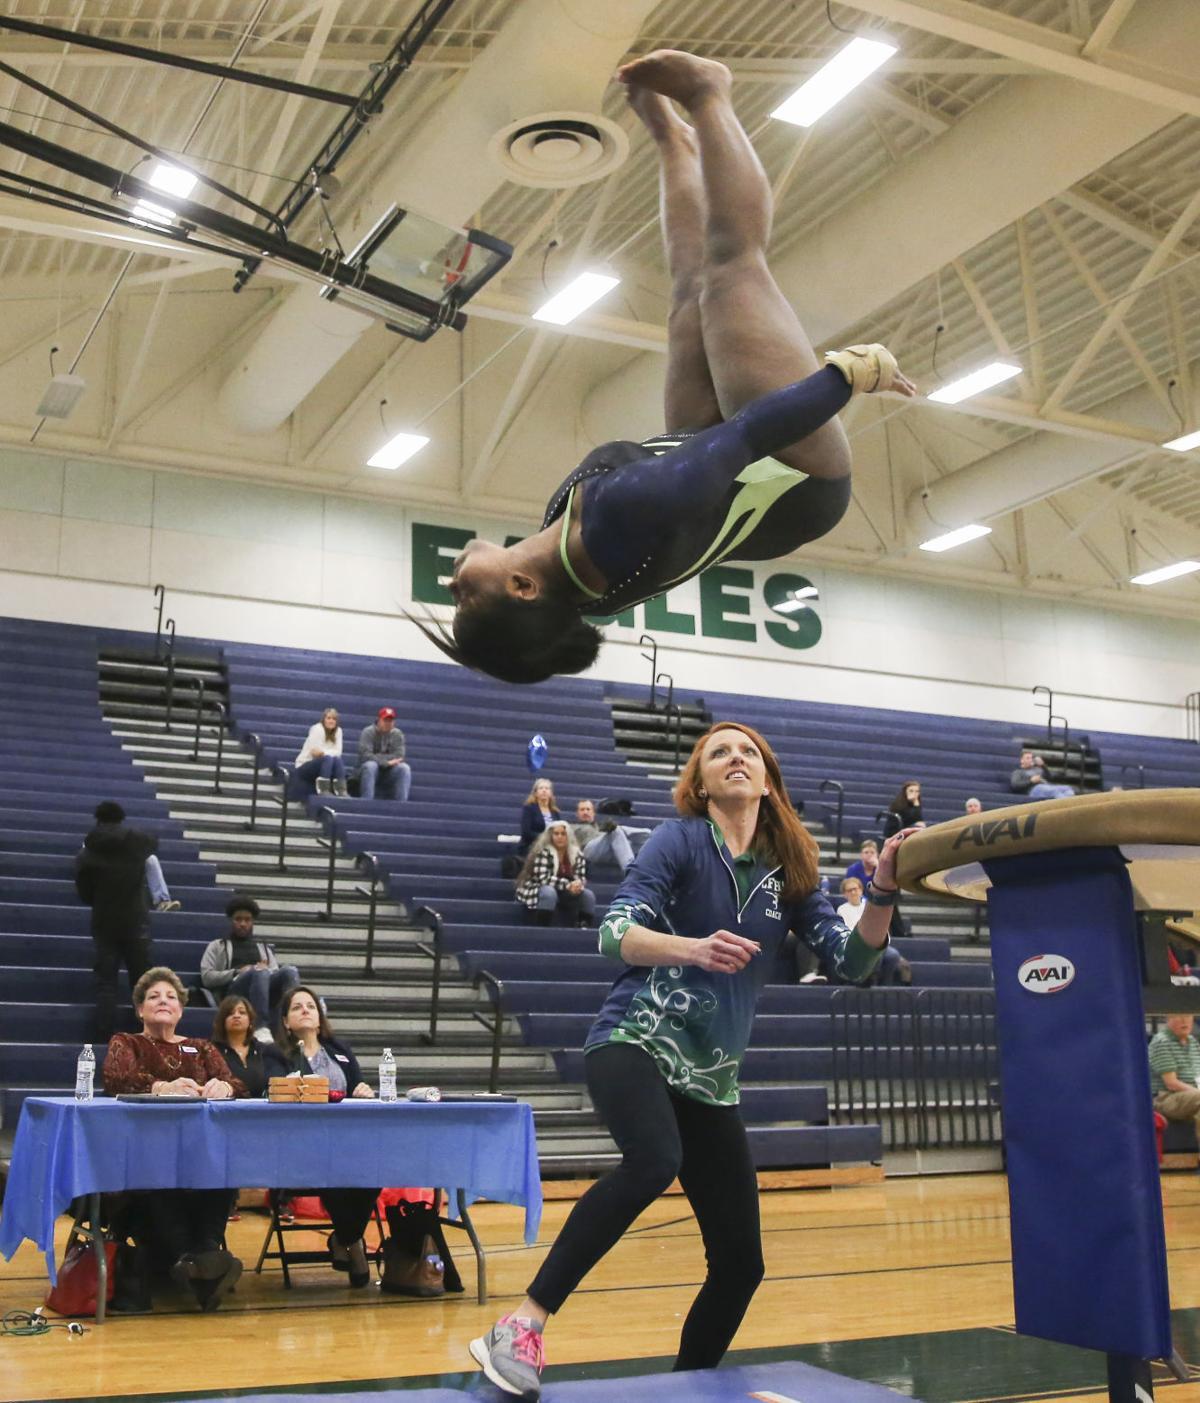 Commonwealth District gymnastics